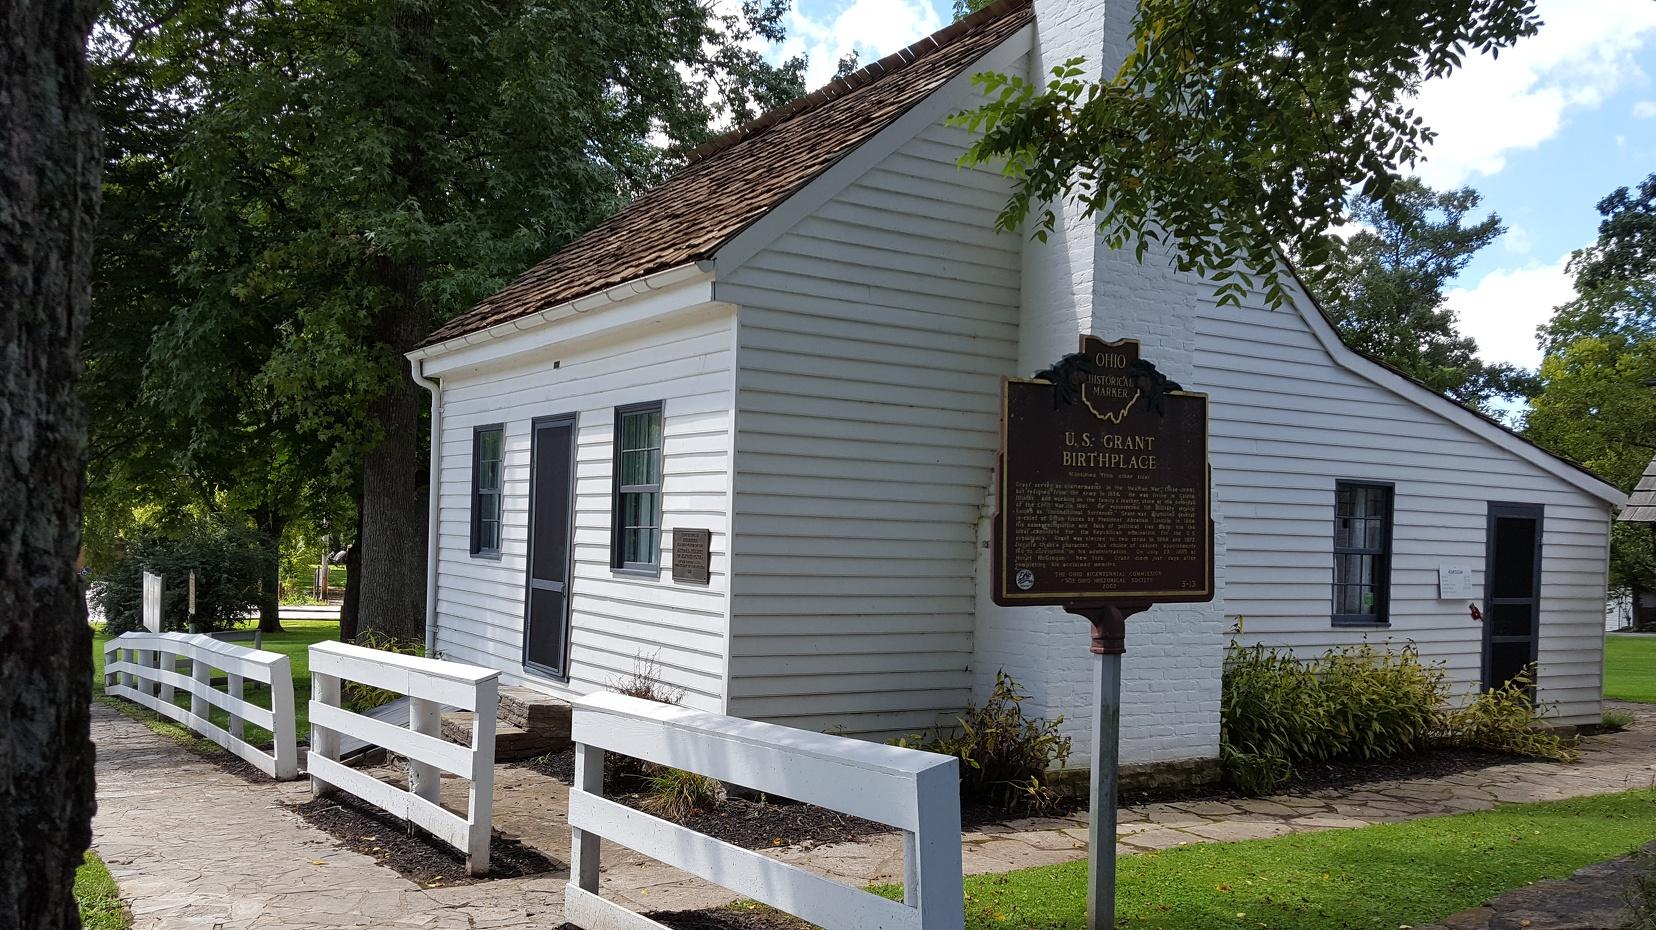 U.S. Grant Birthplace